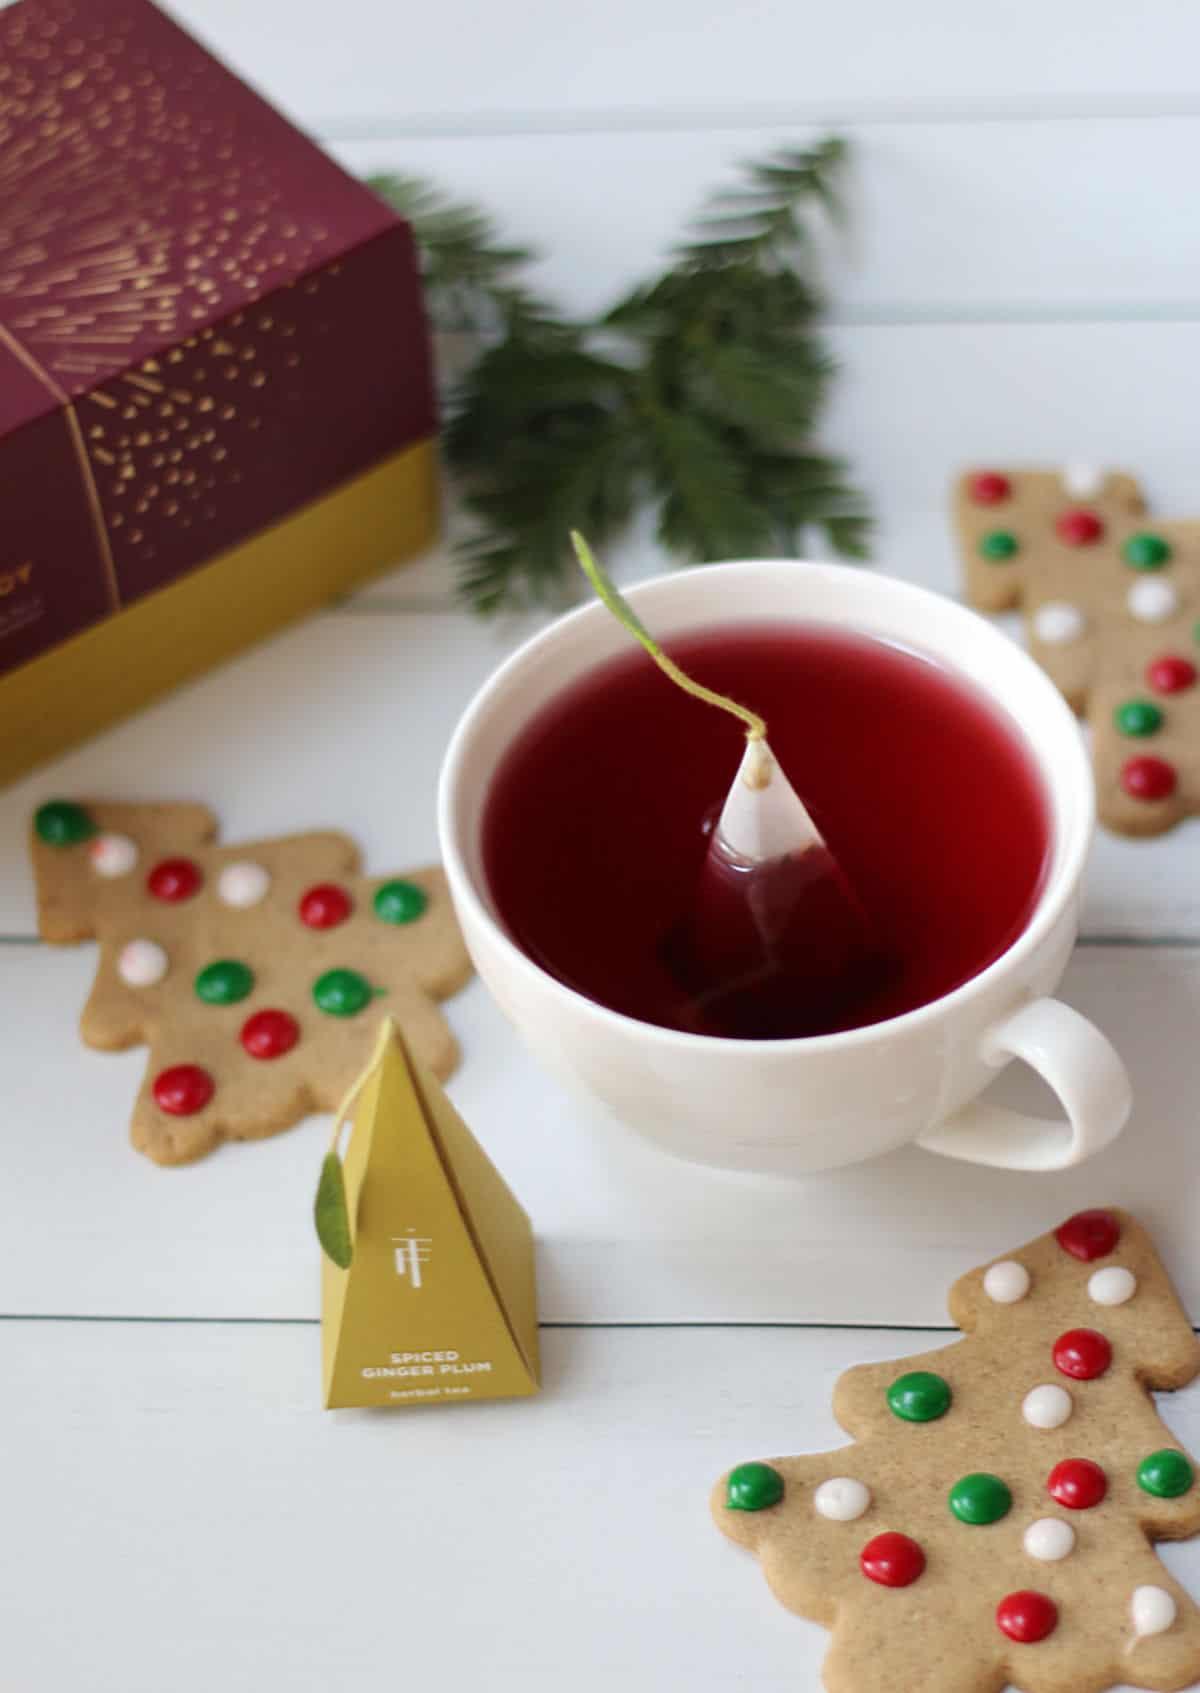 Tea Forte' tea and Christmas cookies.